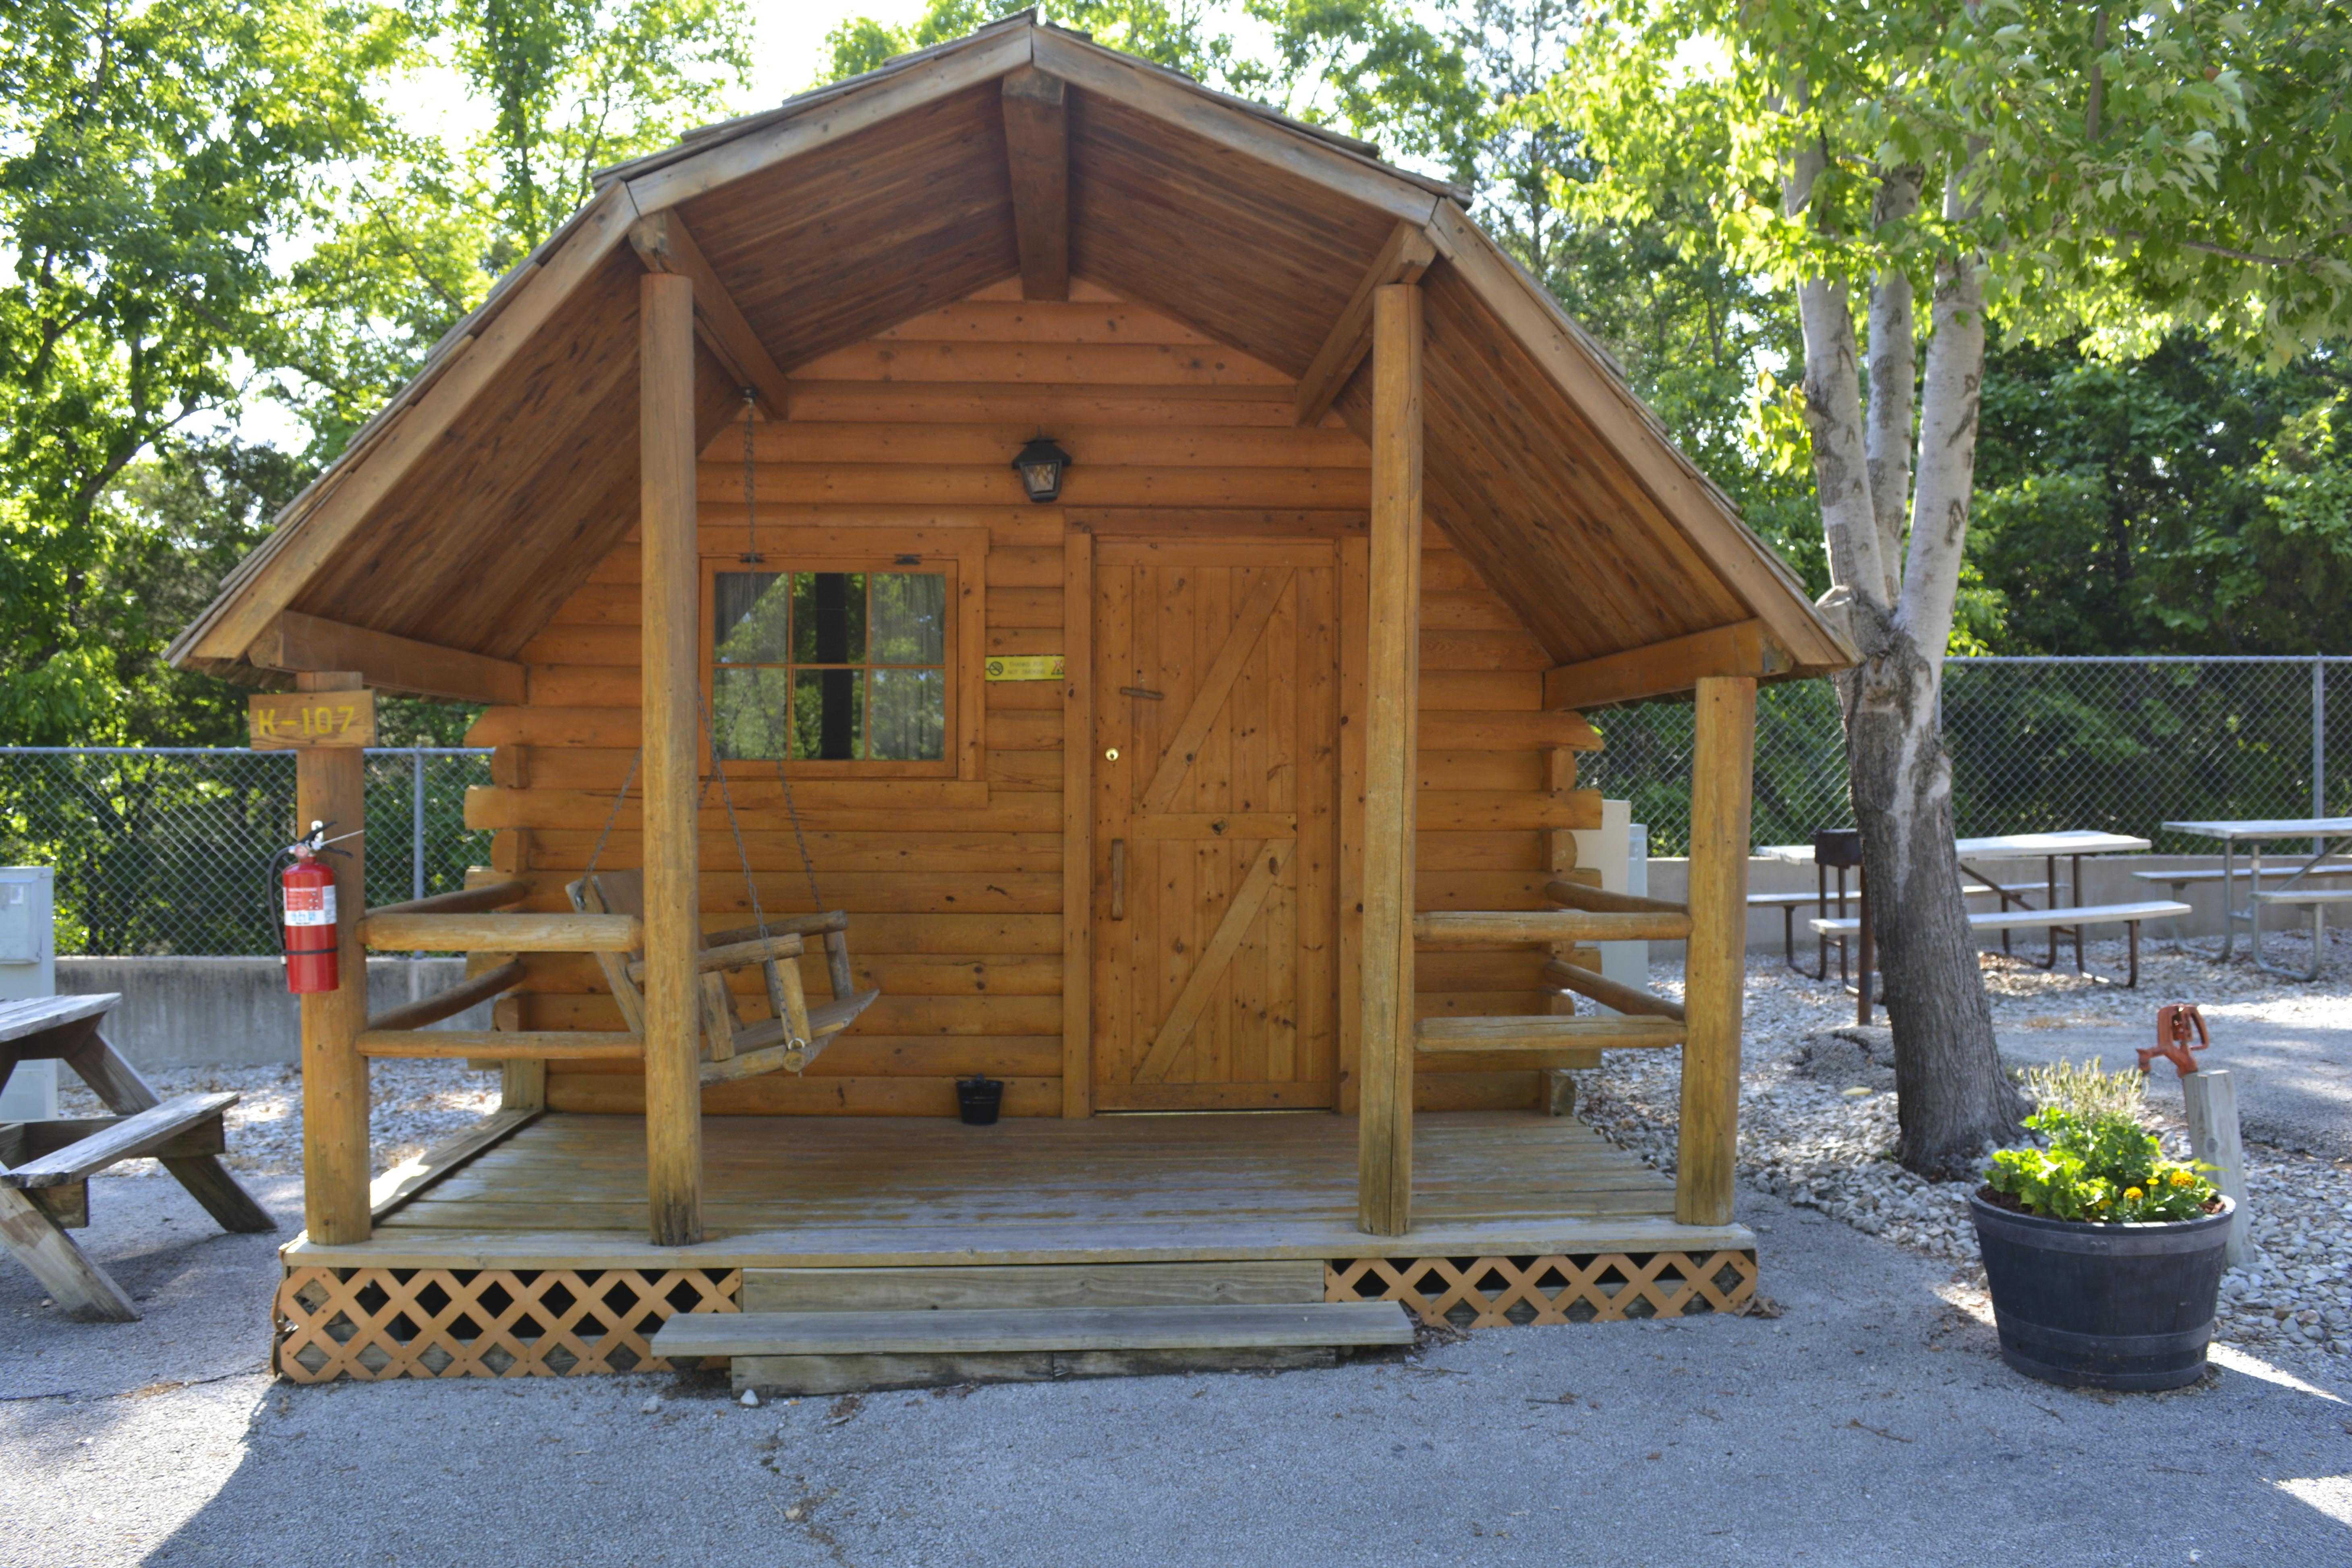 by koa cabin branson camping youtube look cabins a inside watch rv deluxe education